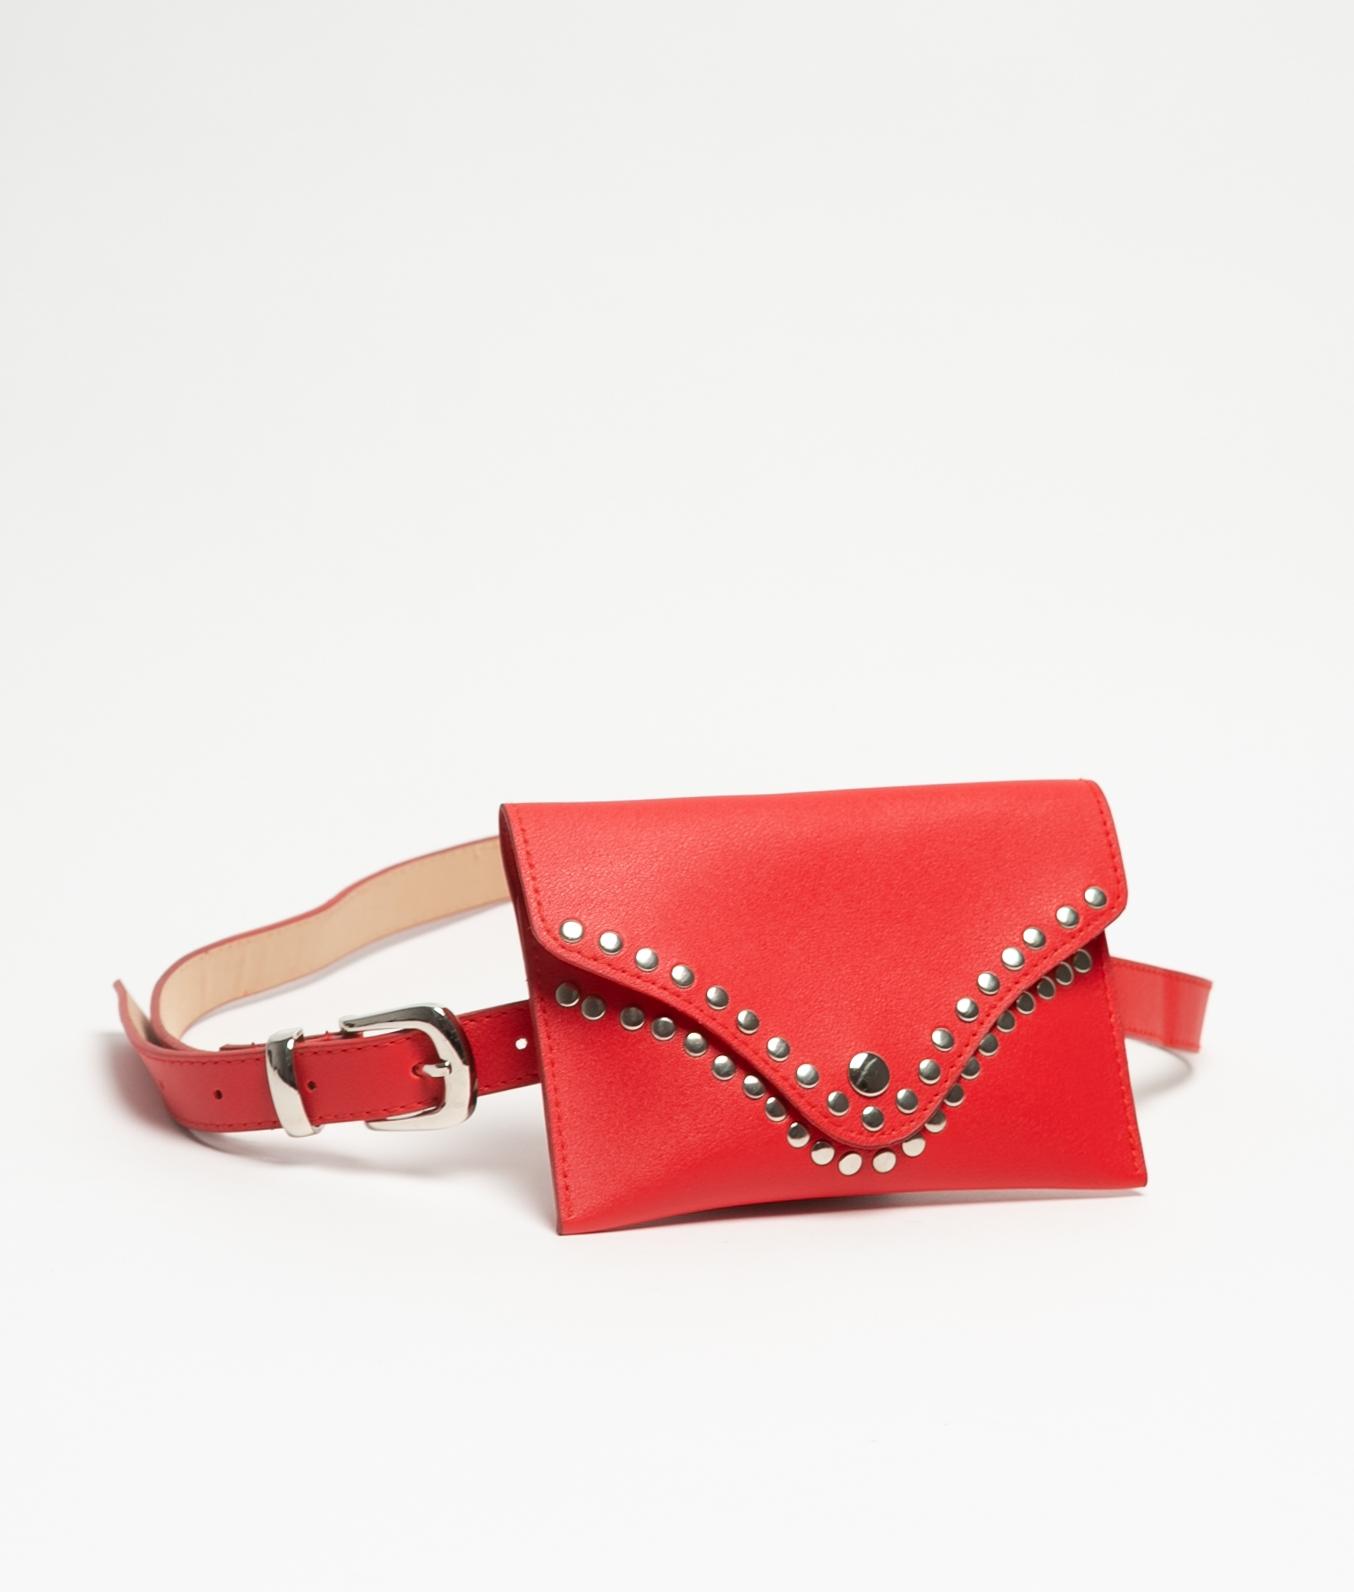 CHEYENNE BELT BAG - RED